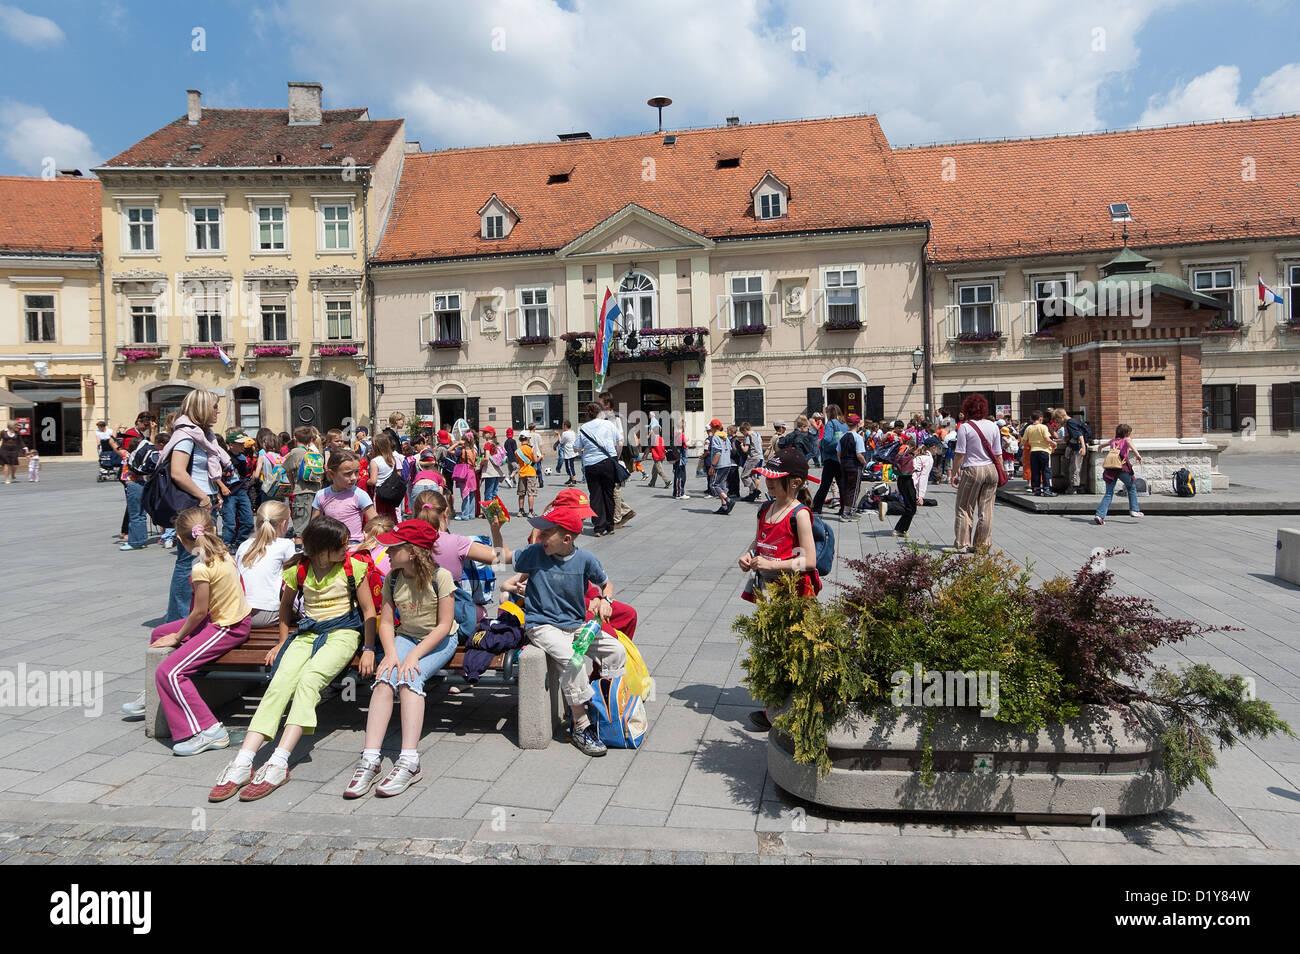 Elk192-1206 Croatia, Samobor, main square with schoolchildren - Stock Image